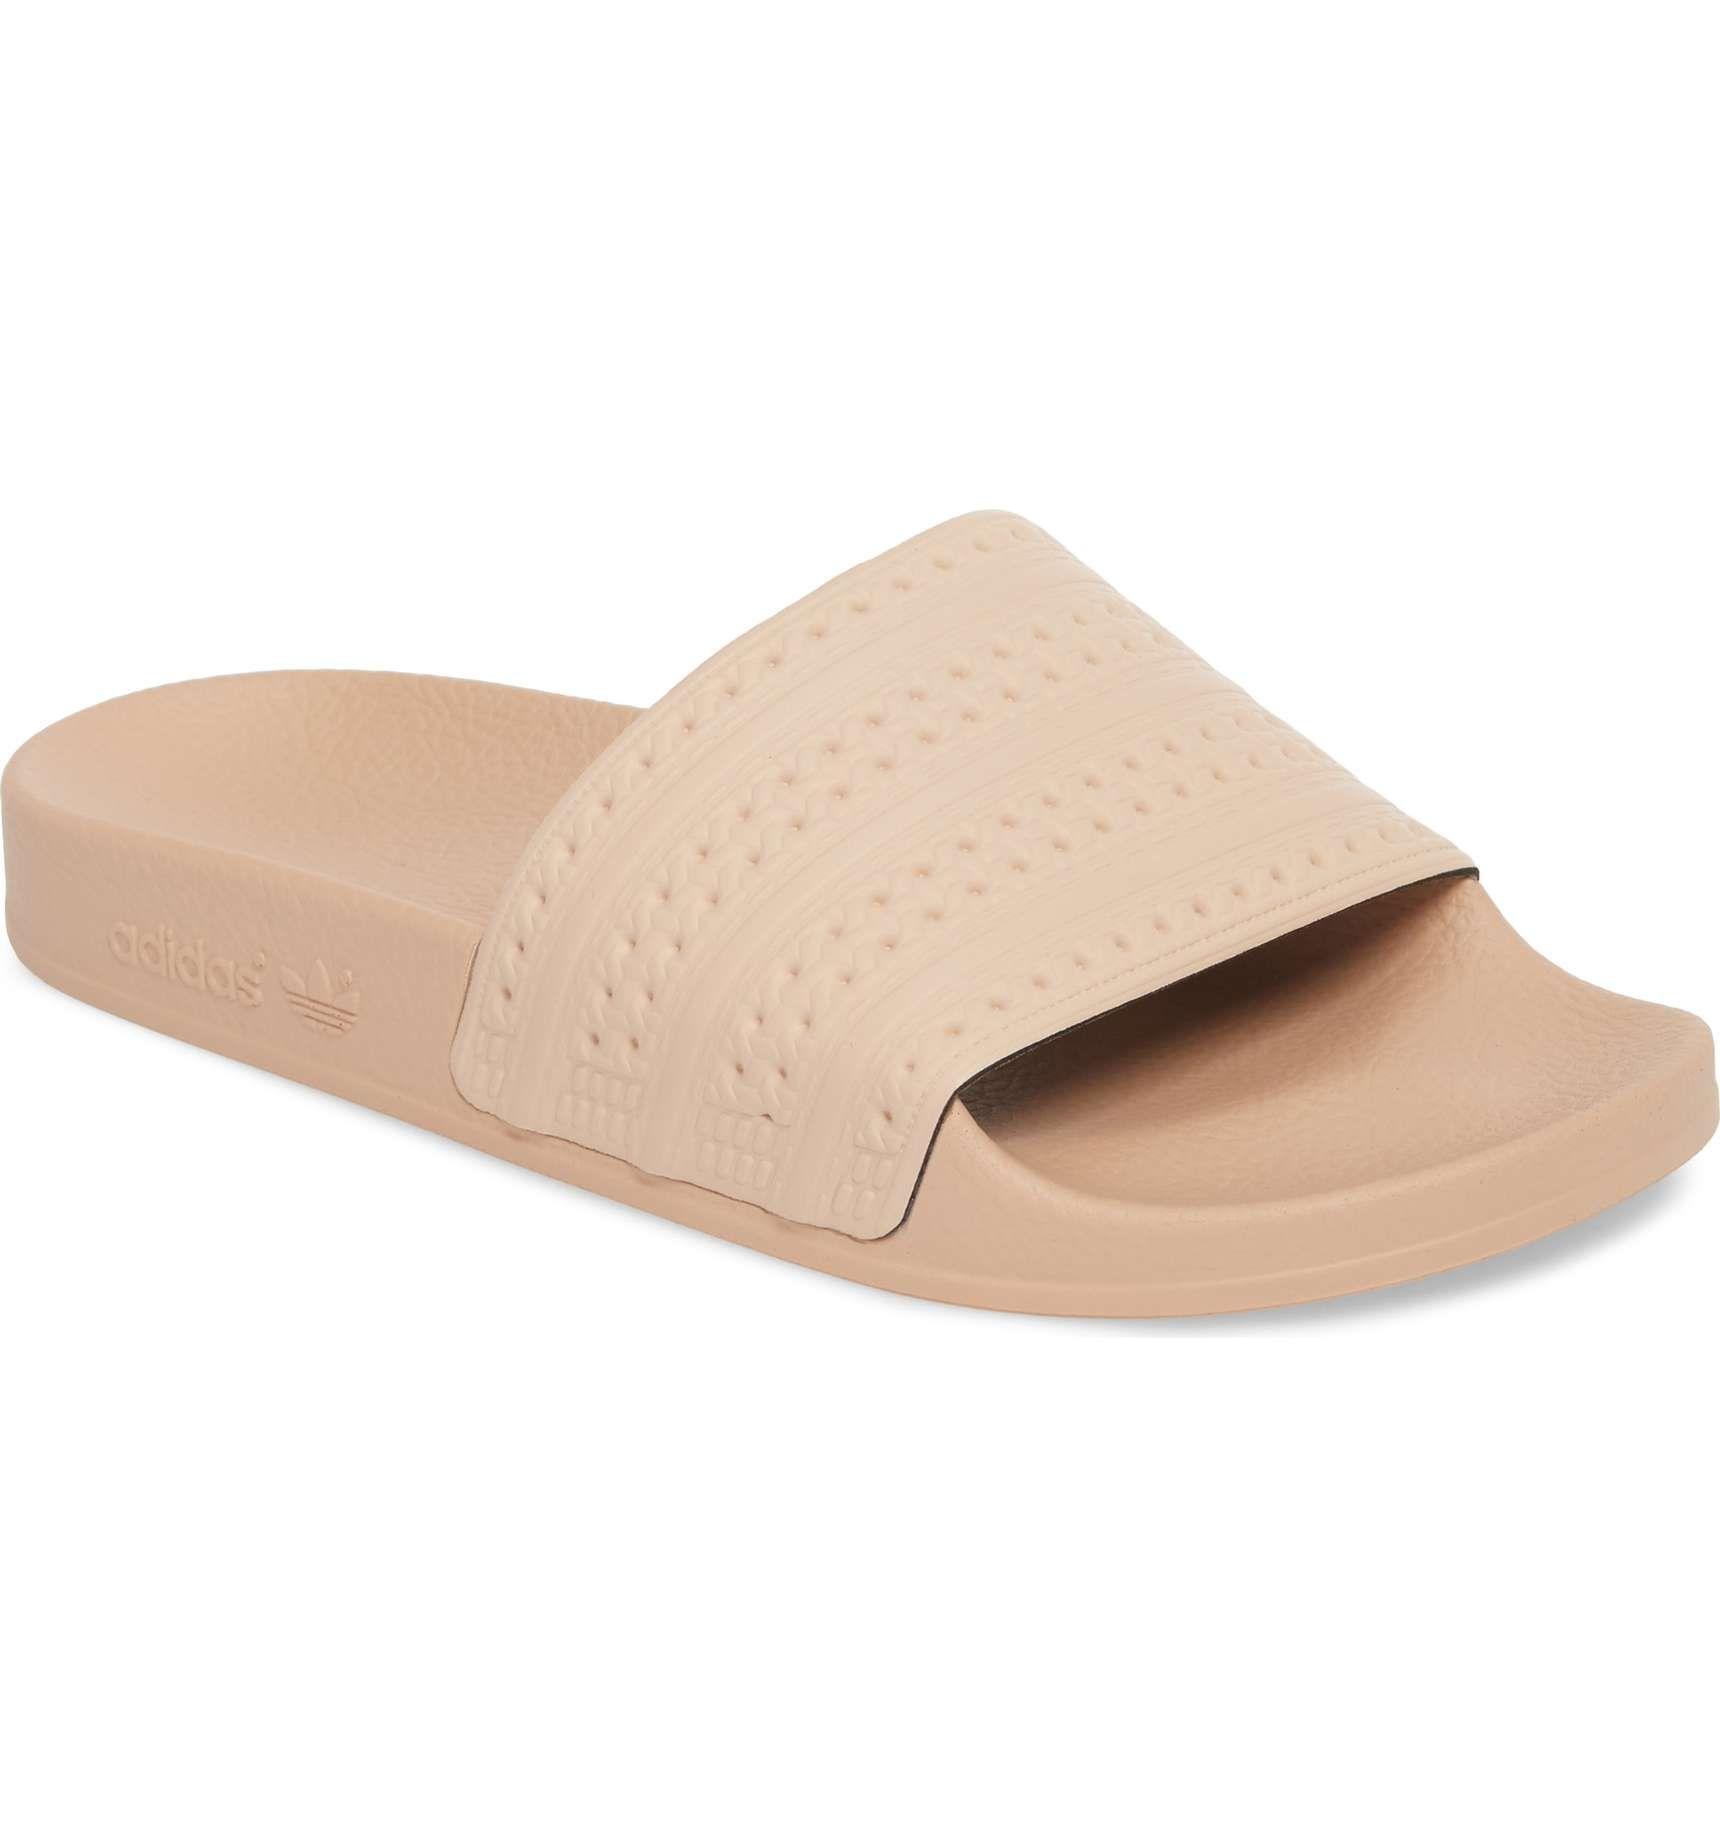 57c5cc37f485 adidas  Adilette  Slide Sandal (Women)